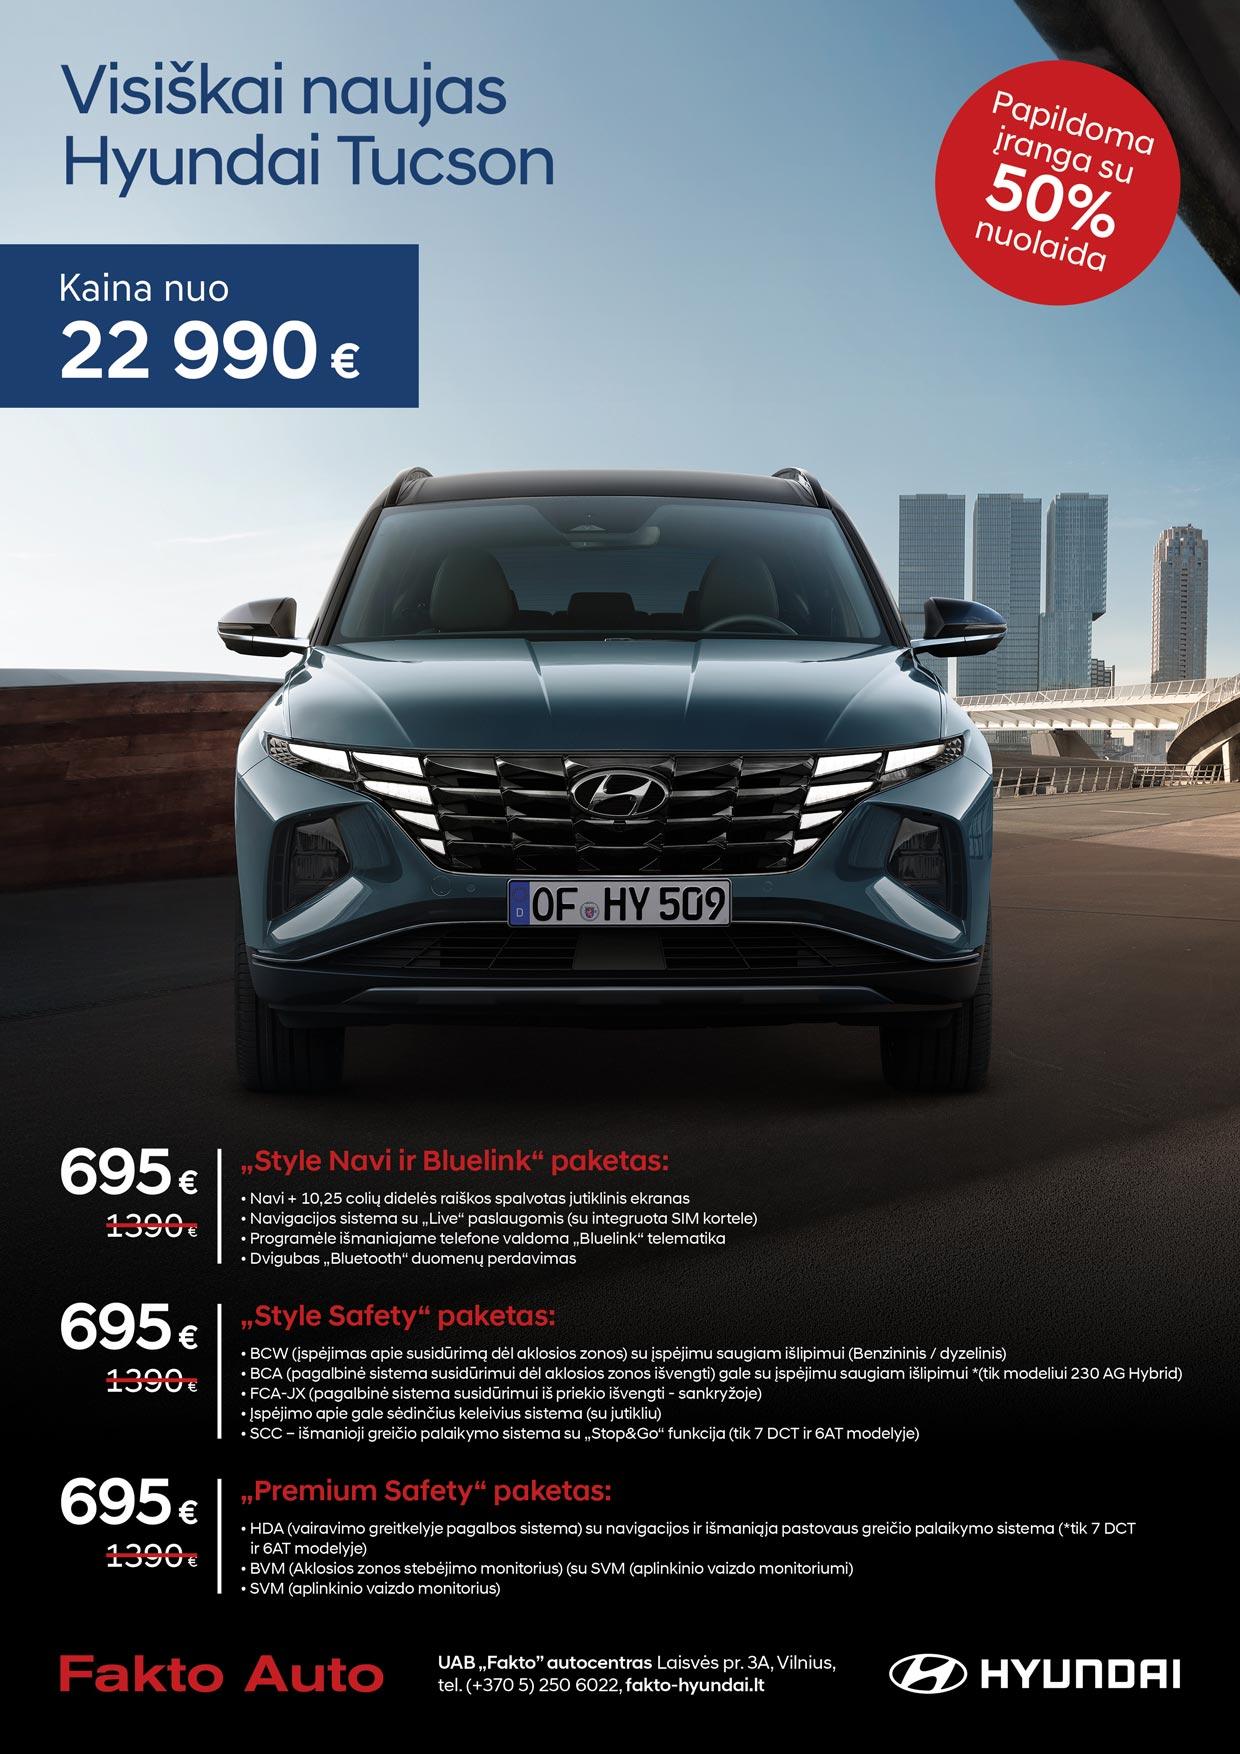 Hyundai tucson irangos pasiulymas